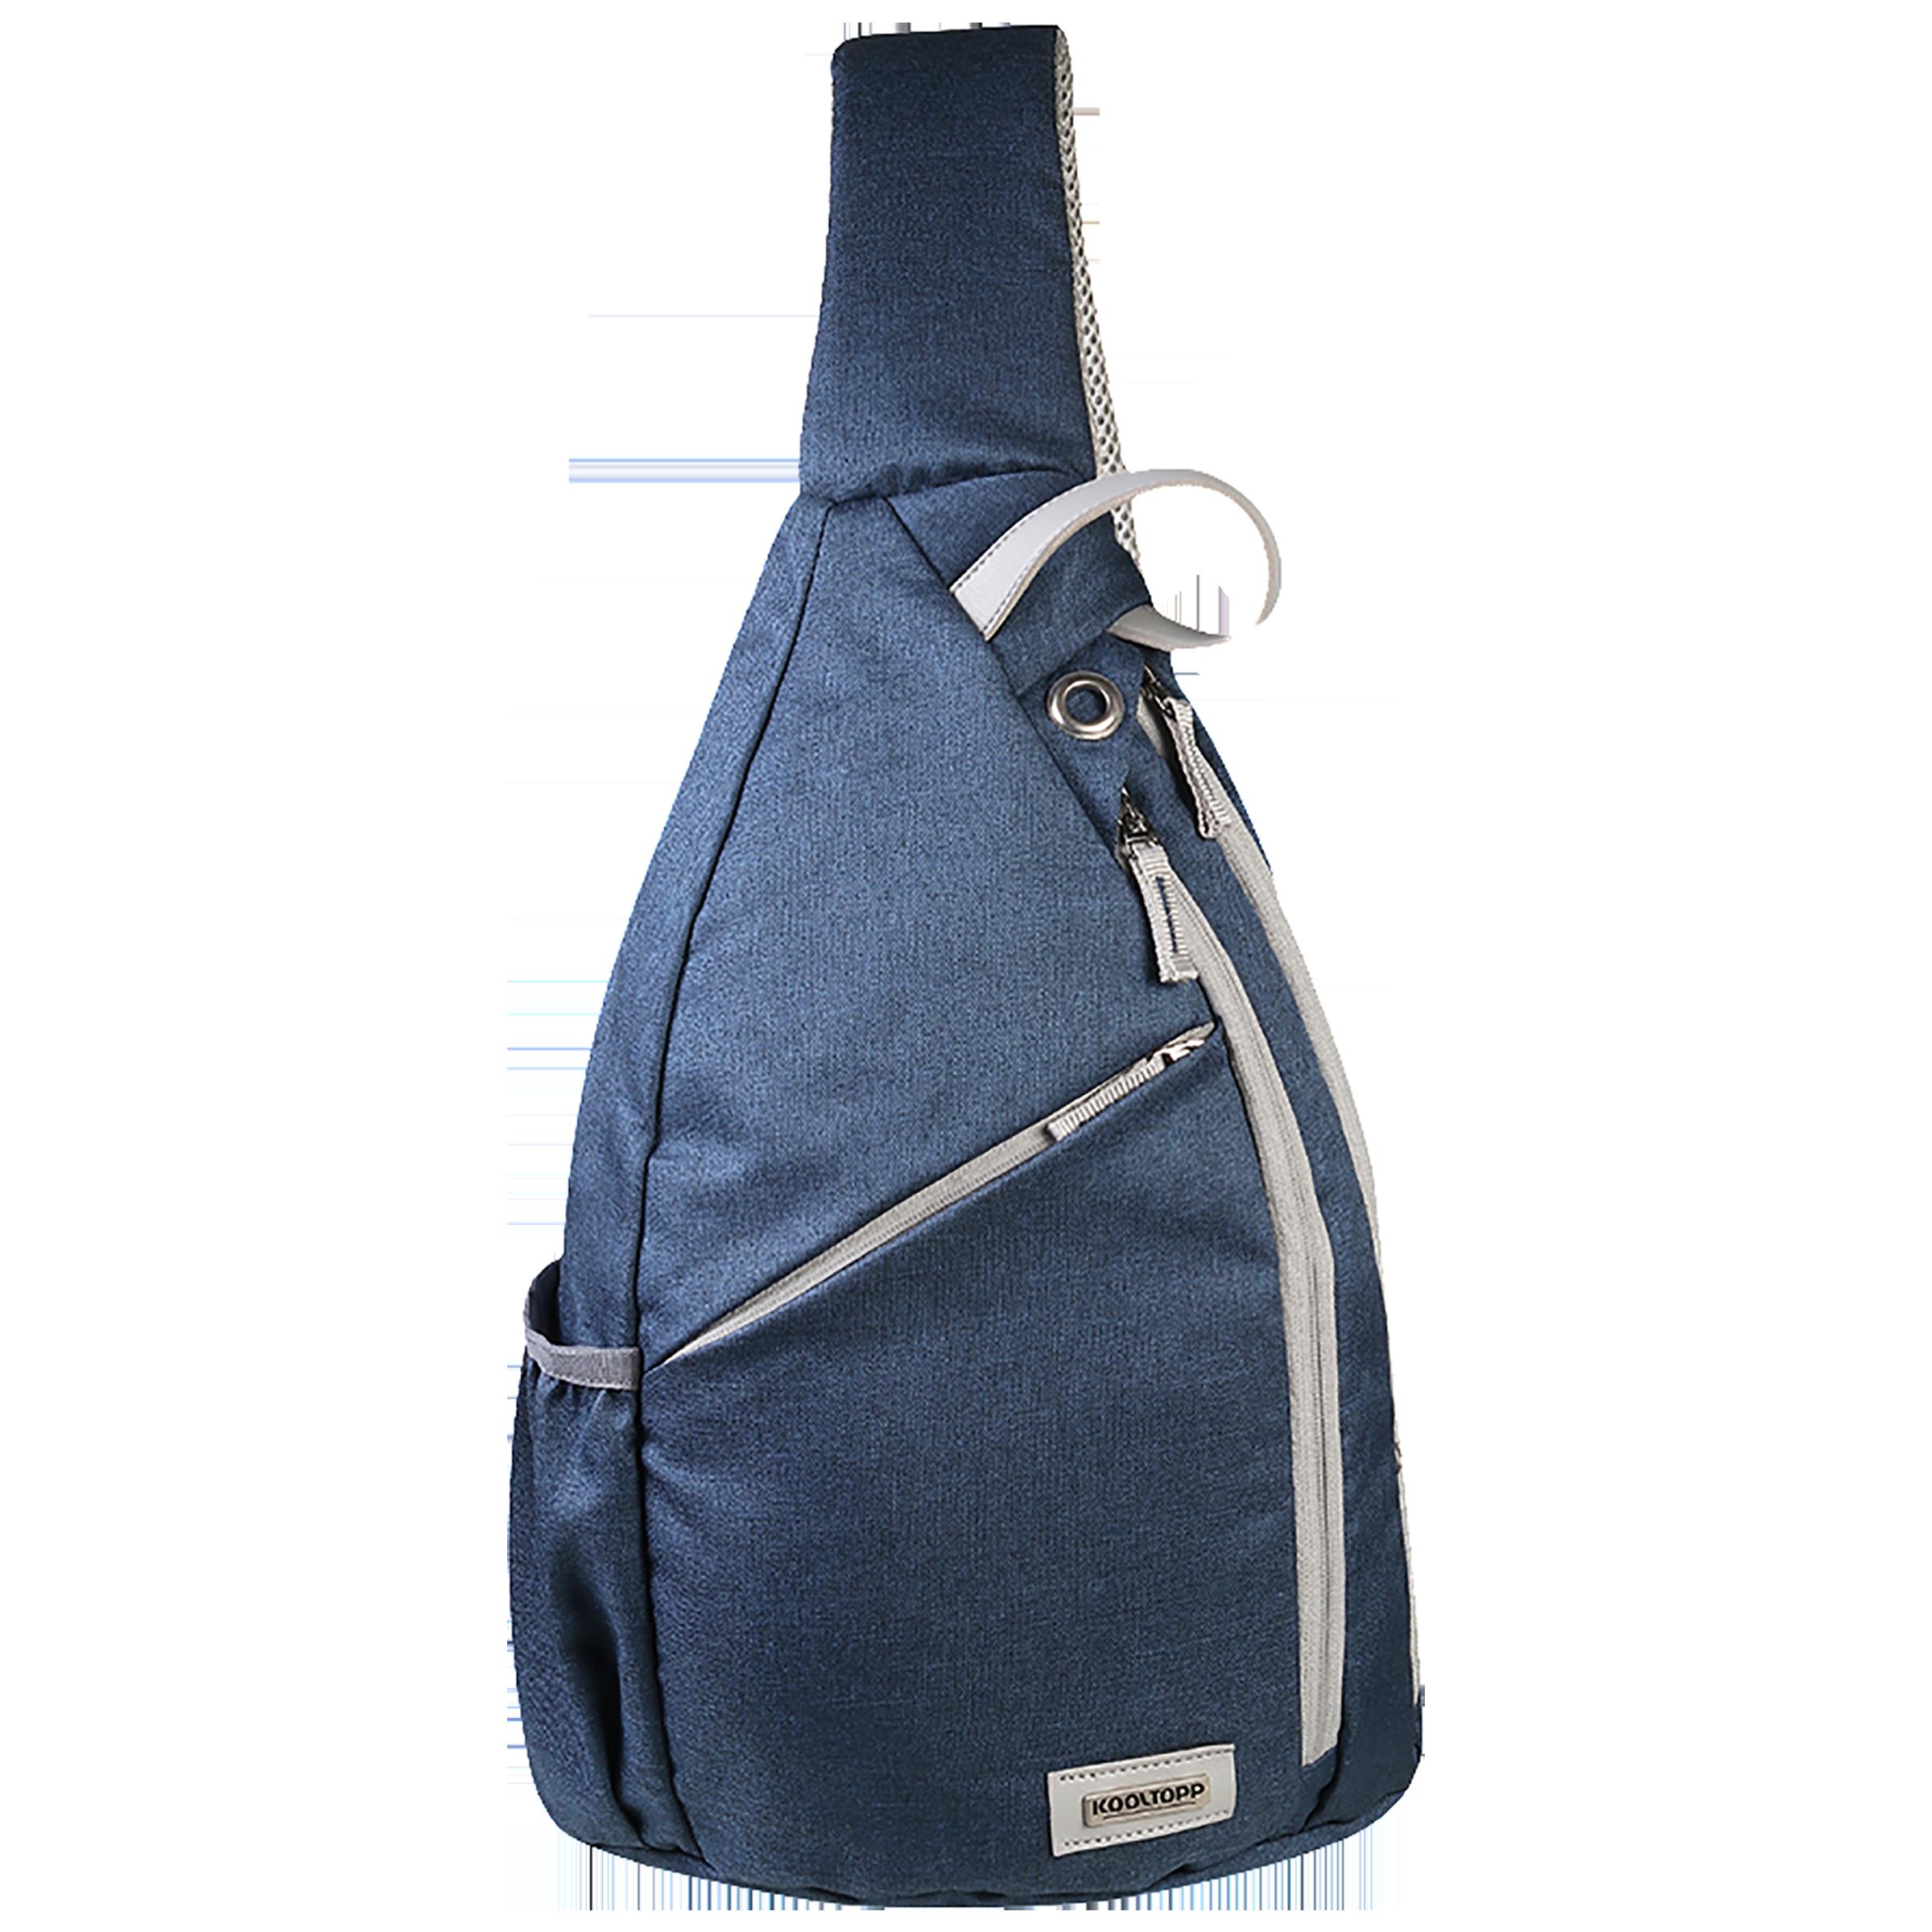 Kooltopp Classy Cross Body 13 Litres Polyester Sling Bag (Water Resistant, KT440-04, Blue/Silver)_1